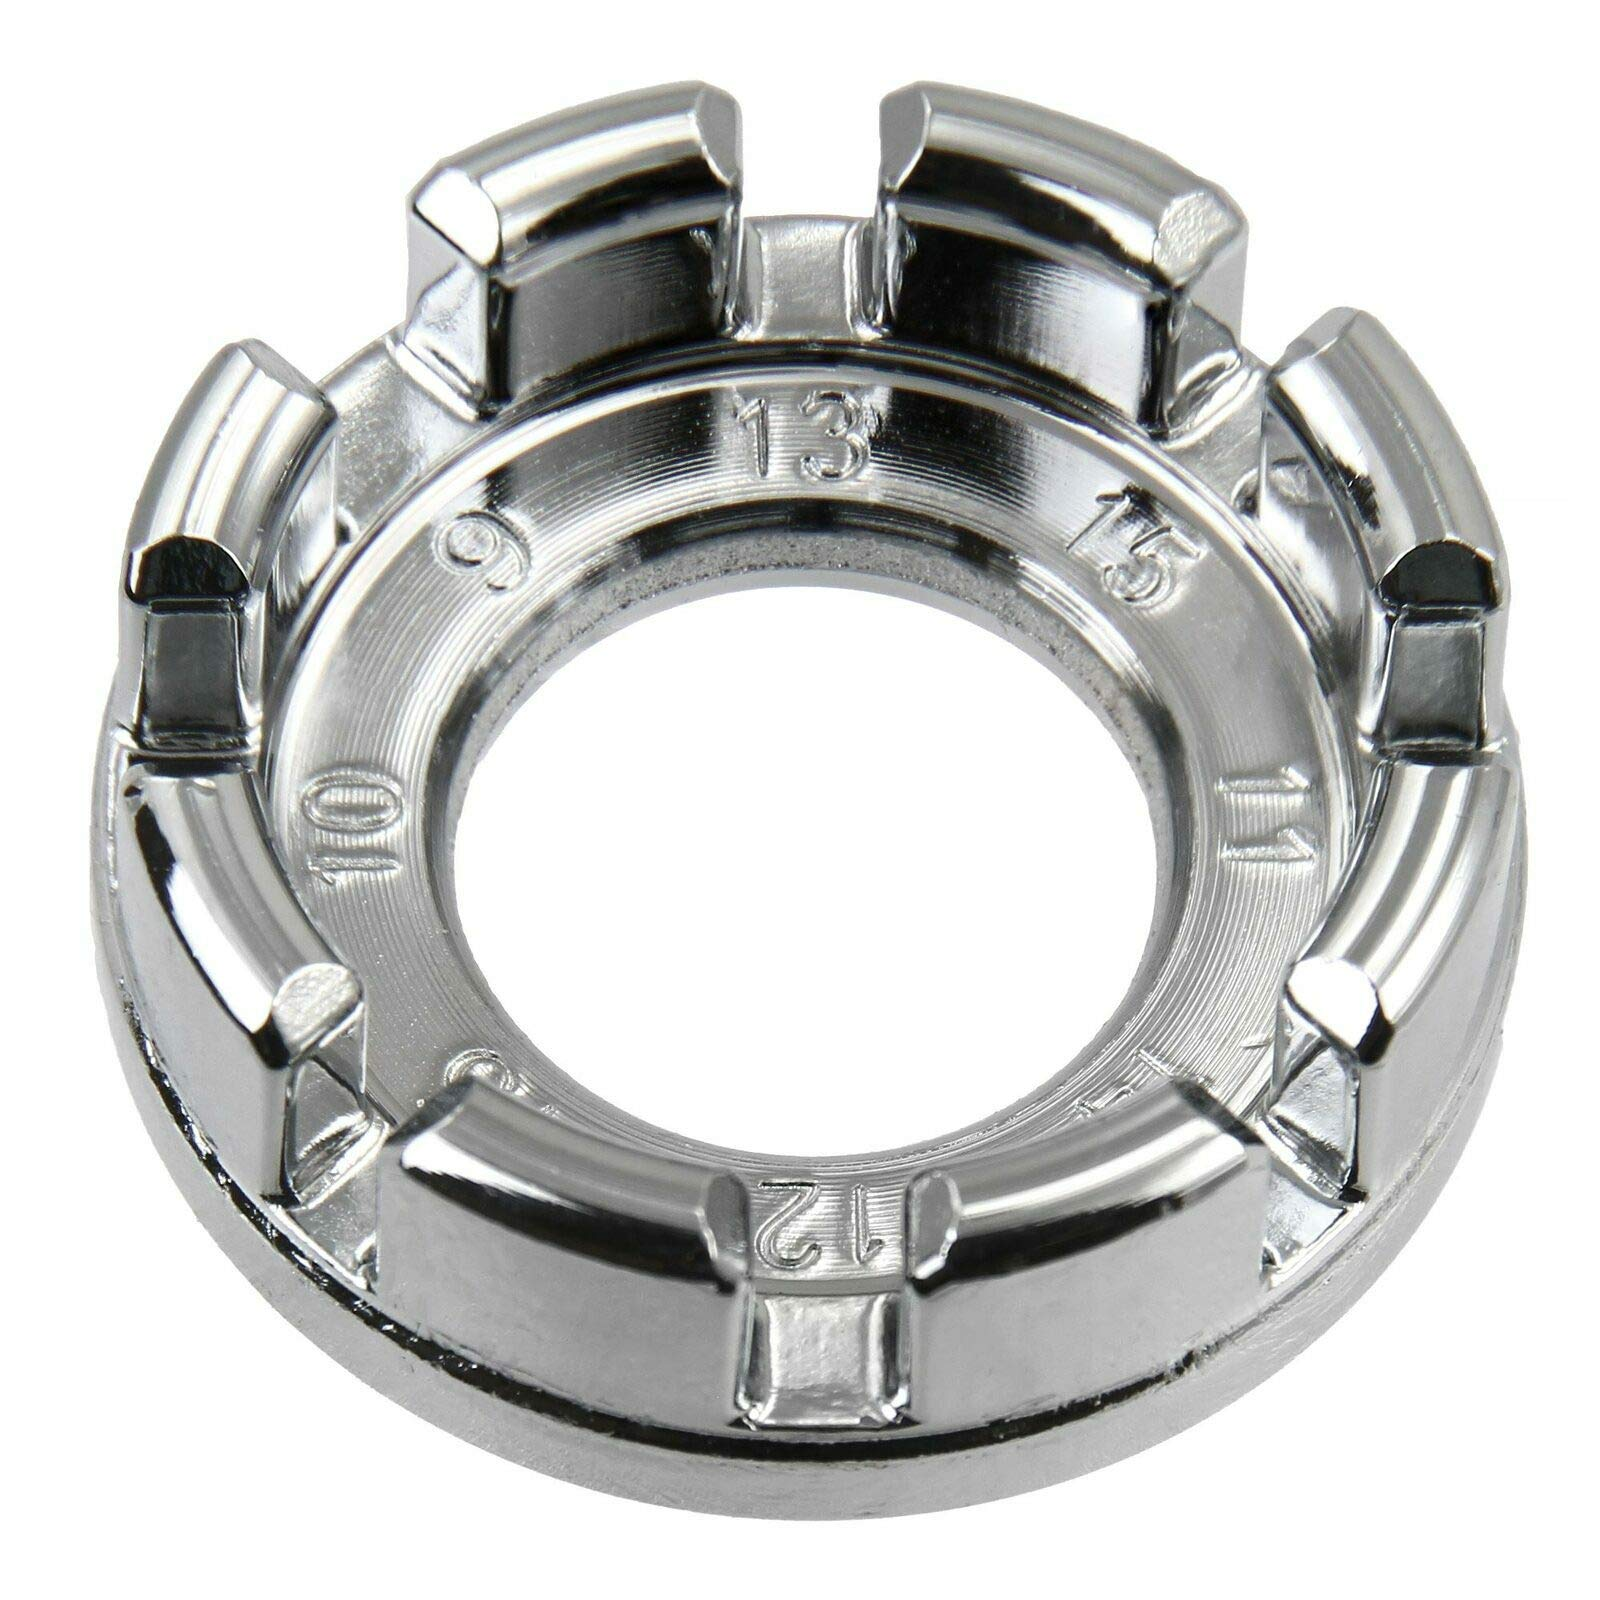 Avenir Round Spoke Wrench